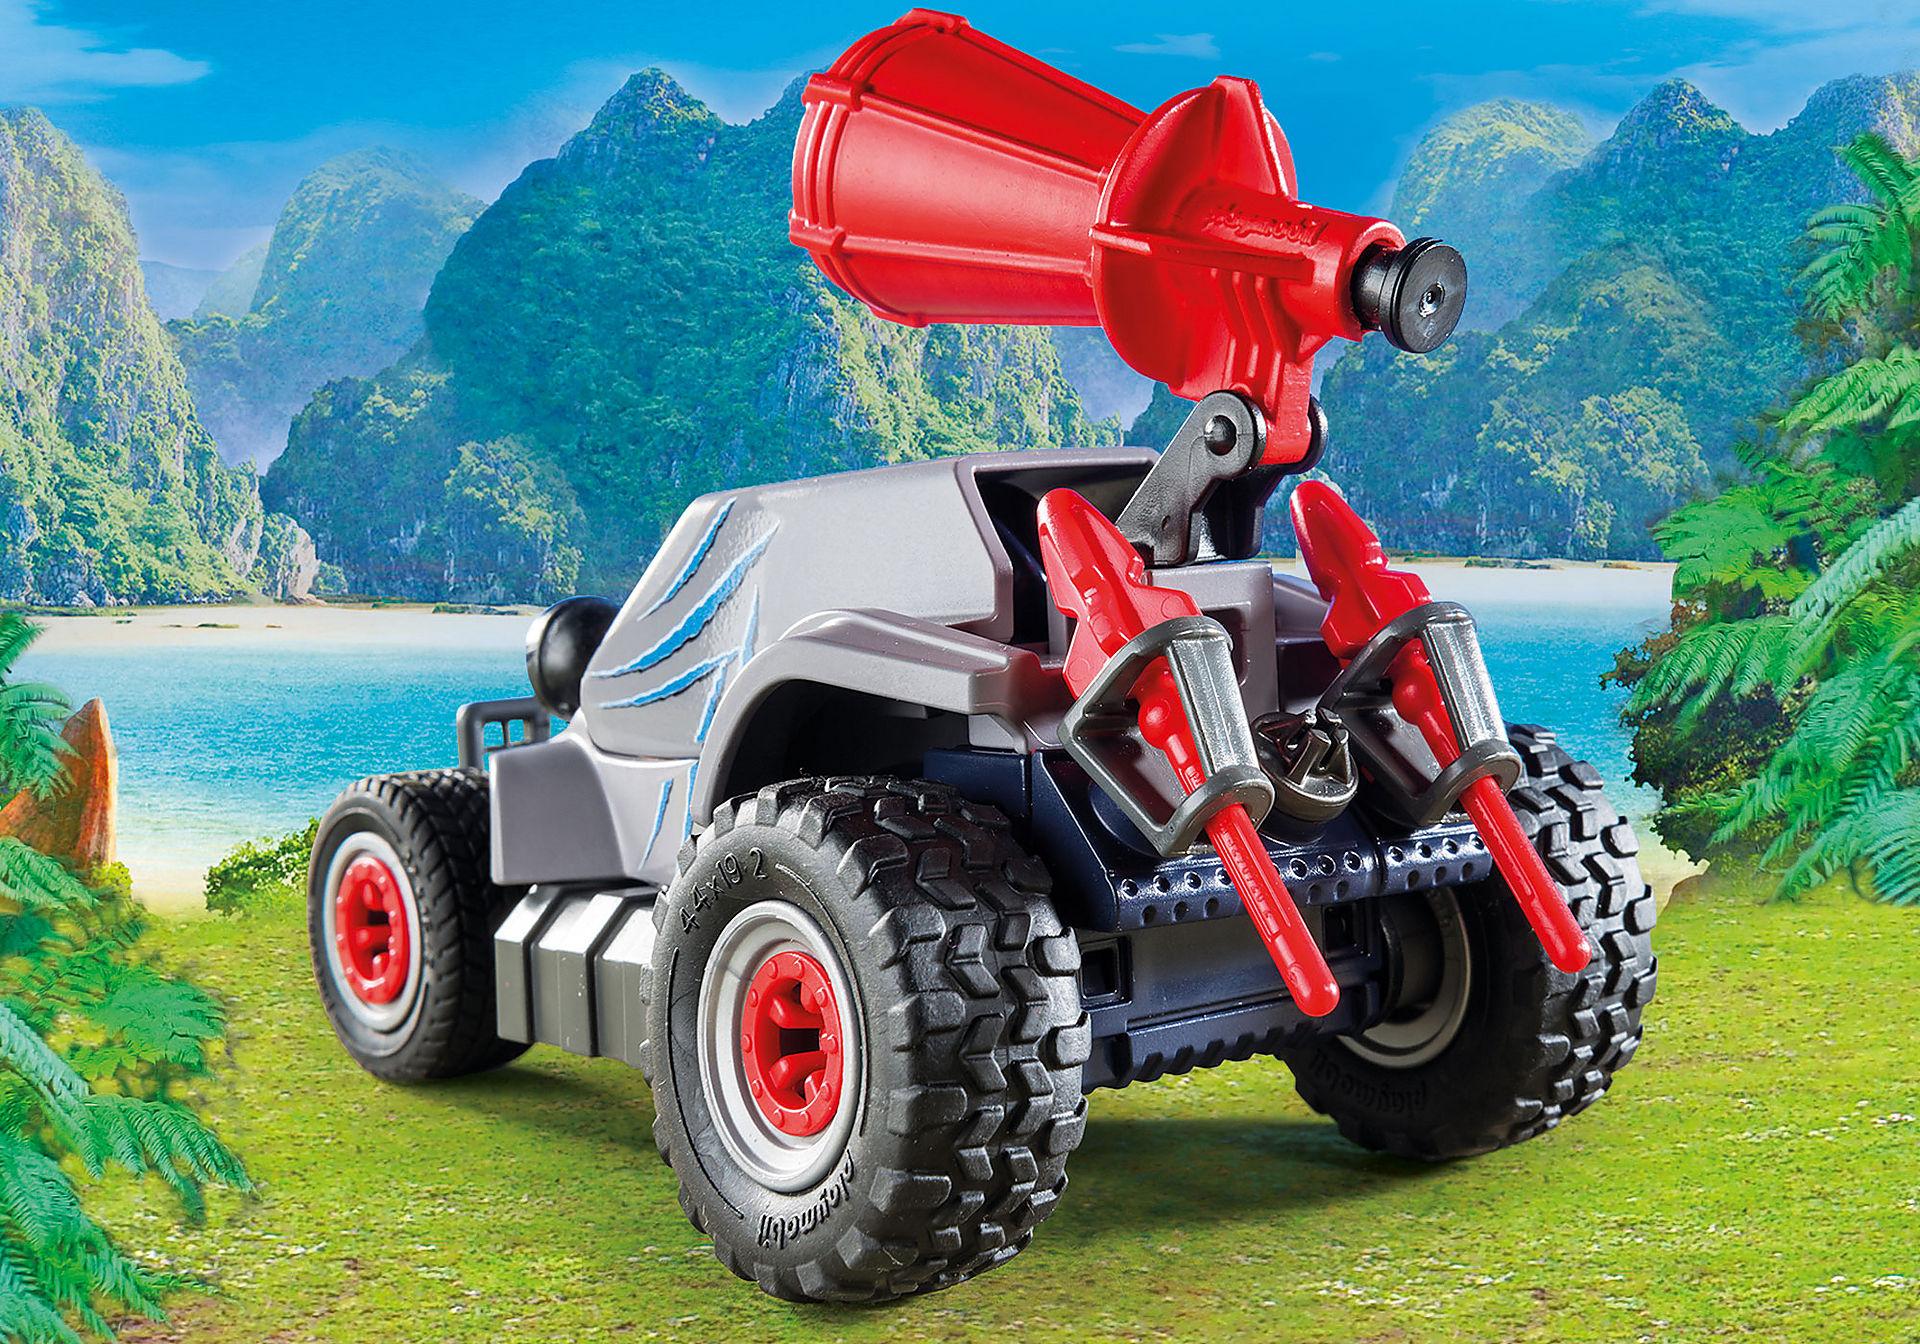 http://media.playmobil.com/i/playmobil/9434_product_extra1/Όχημα λαθροκυνηγών και οικογένεια Τρικεράτωψ